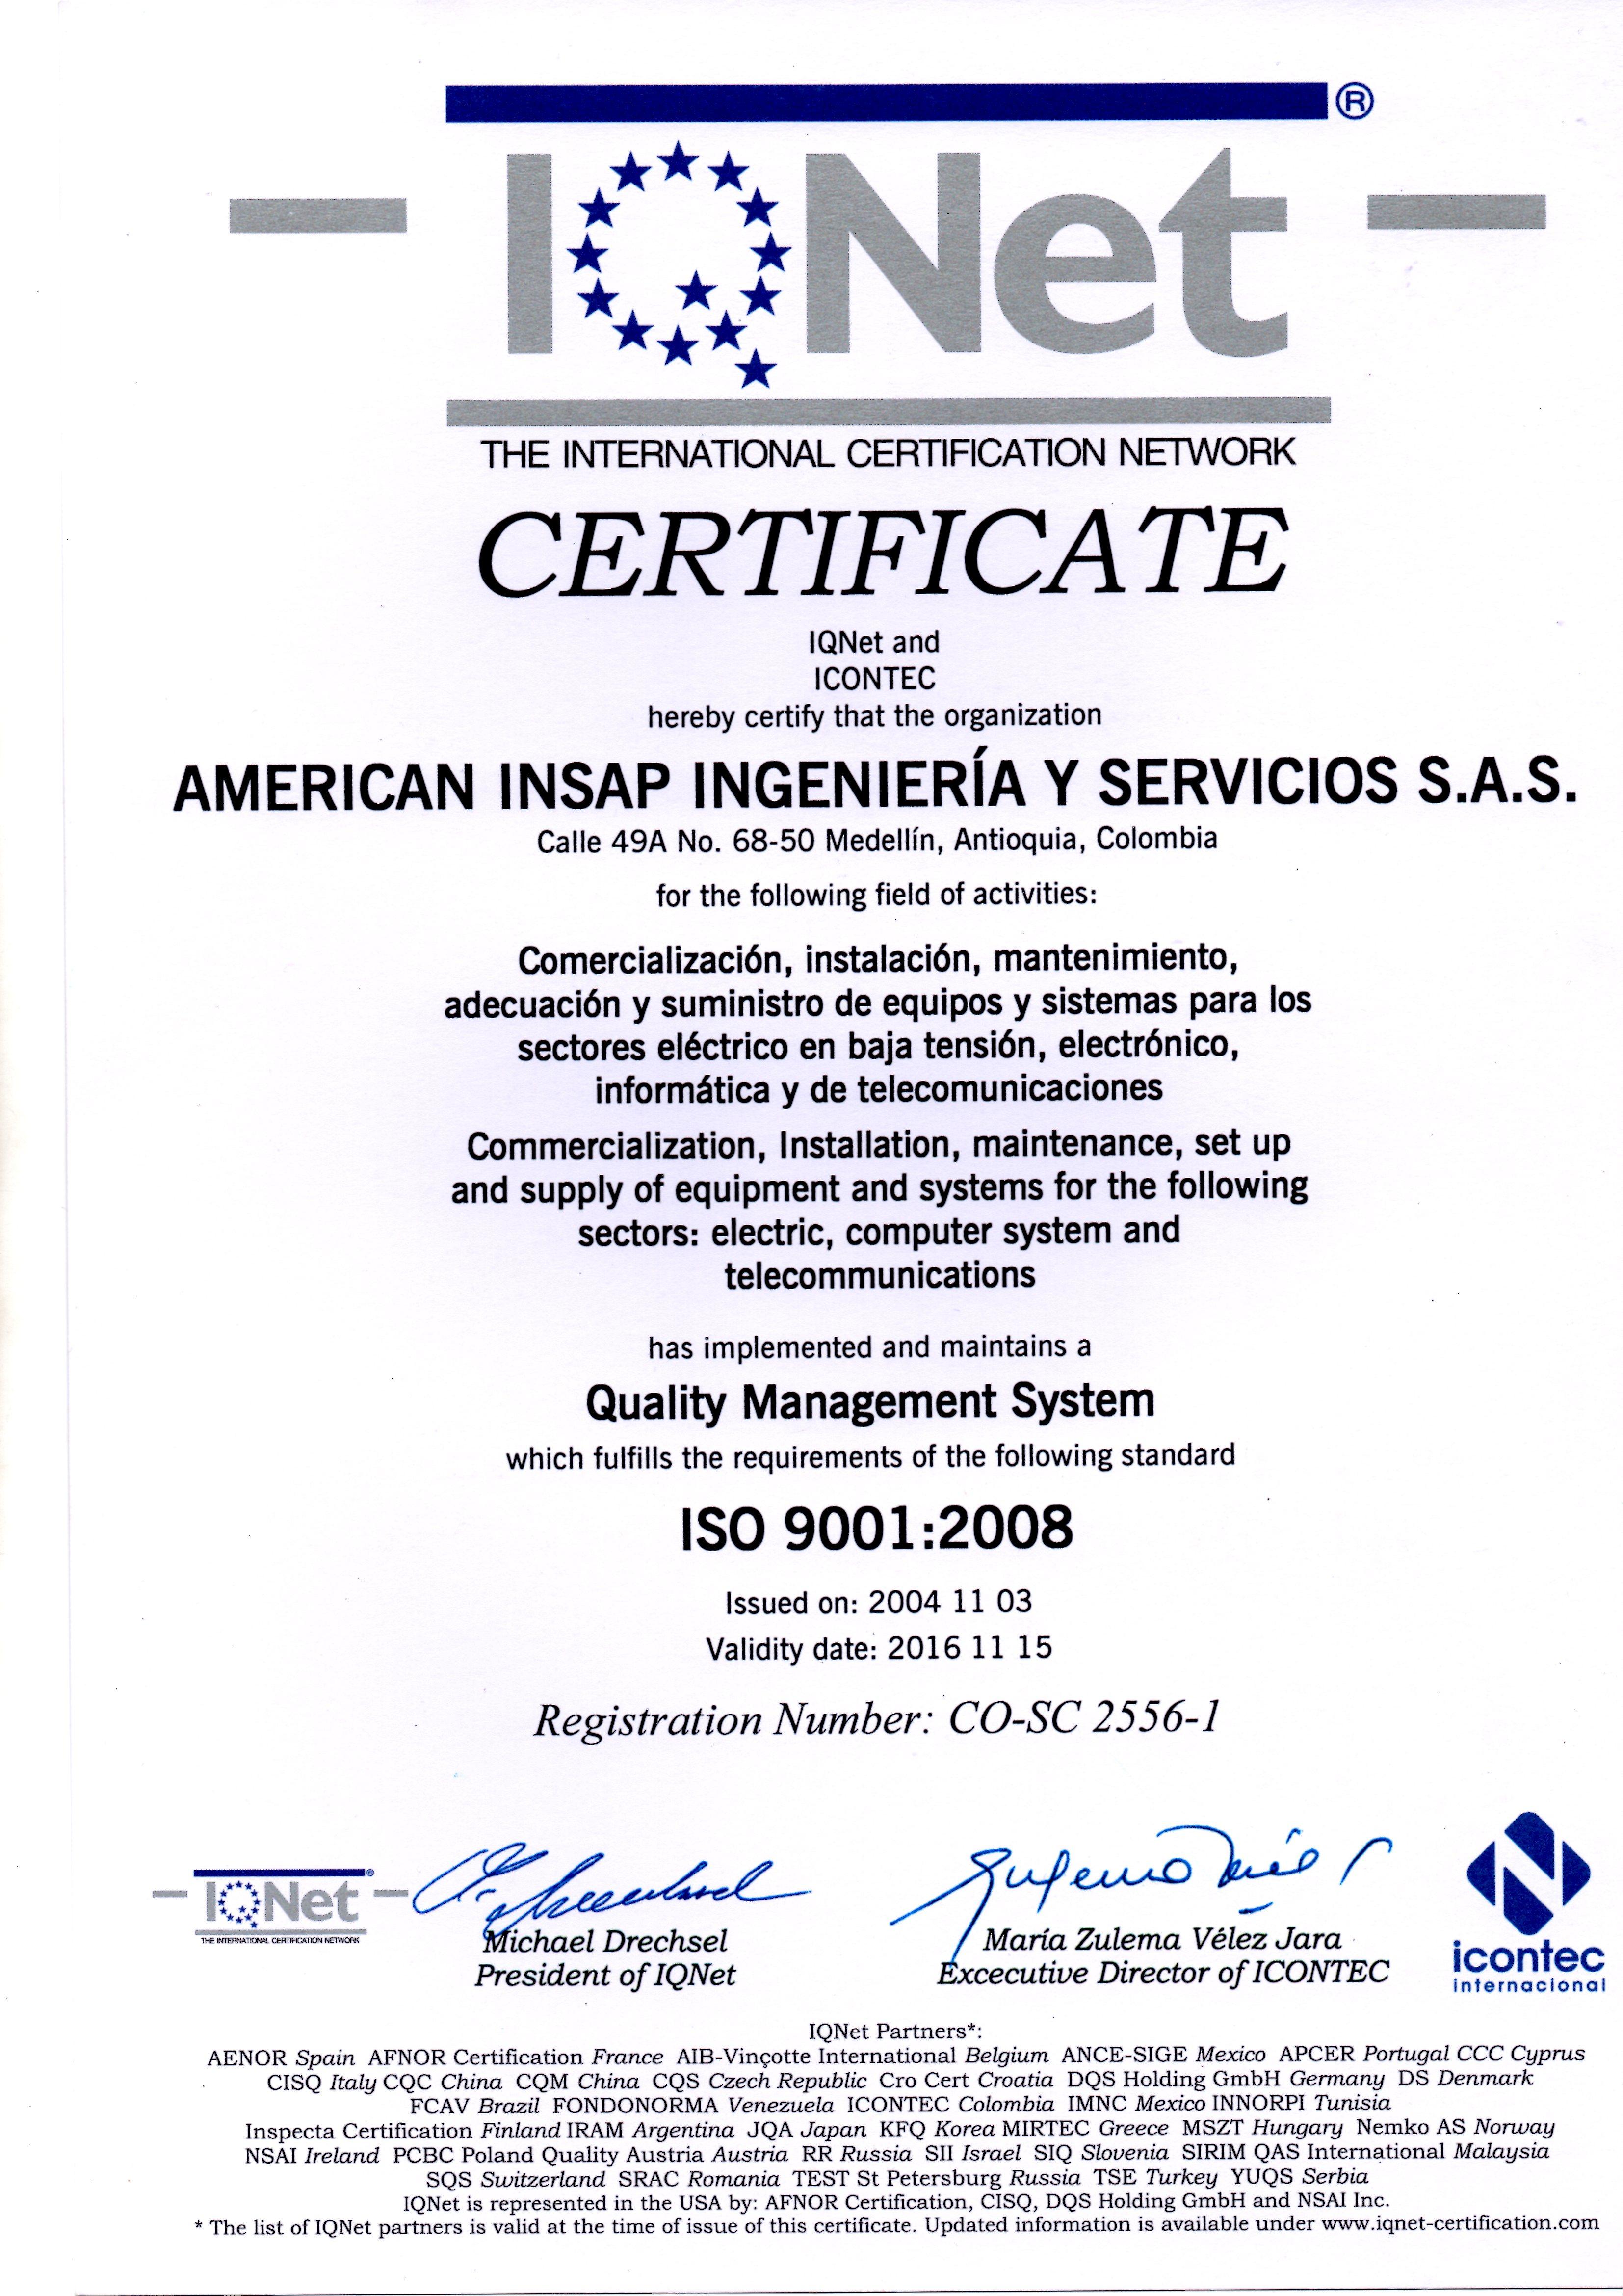 Certificado IQNET - American Insap